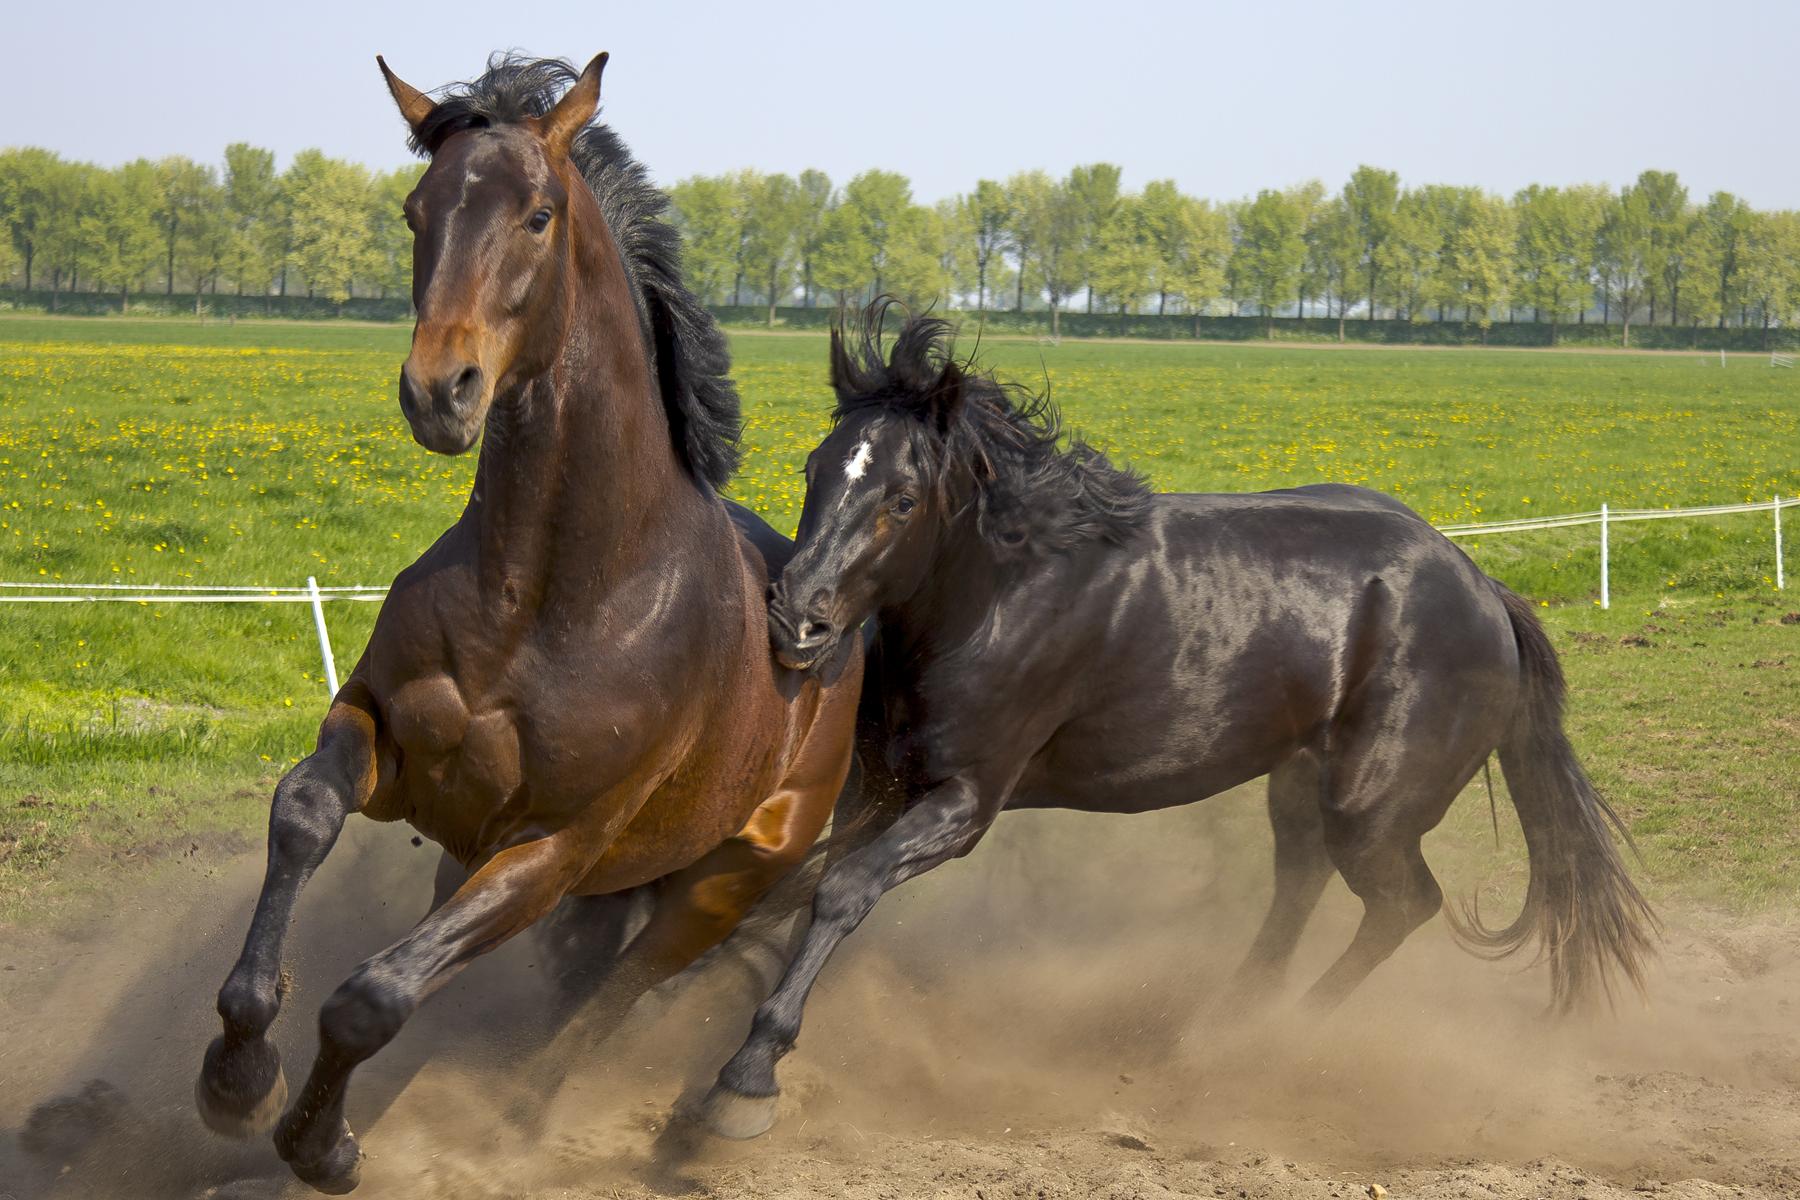 Wild Horses Flickr Photo Sharing